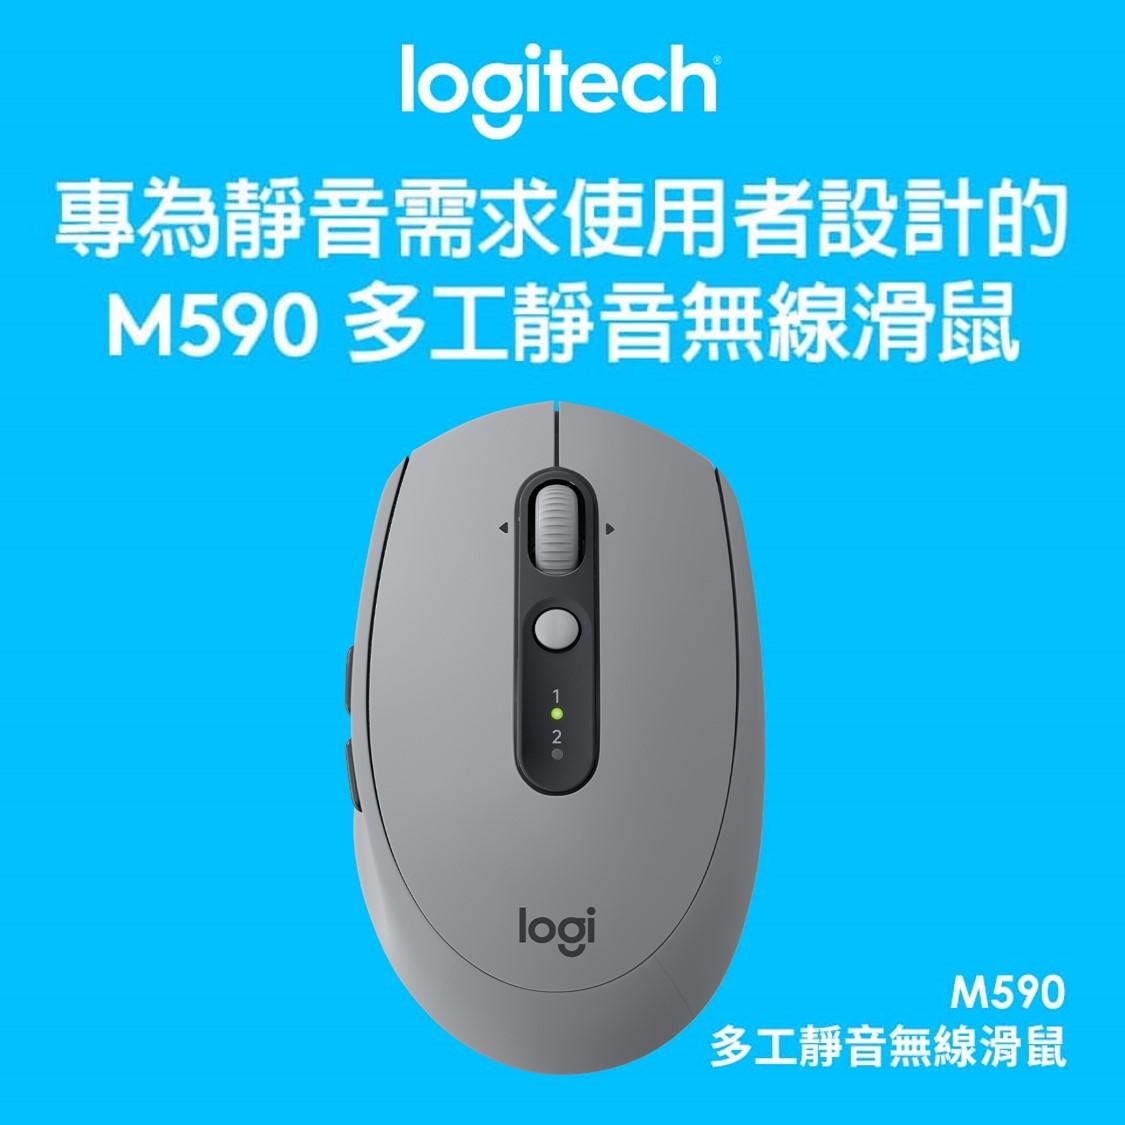 Logitech羅技 M590 多工靜音無線滑鼠 石板灰(910-005201)